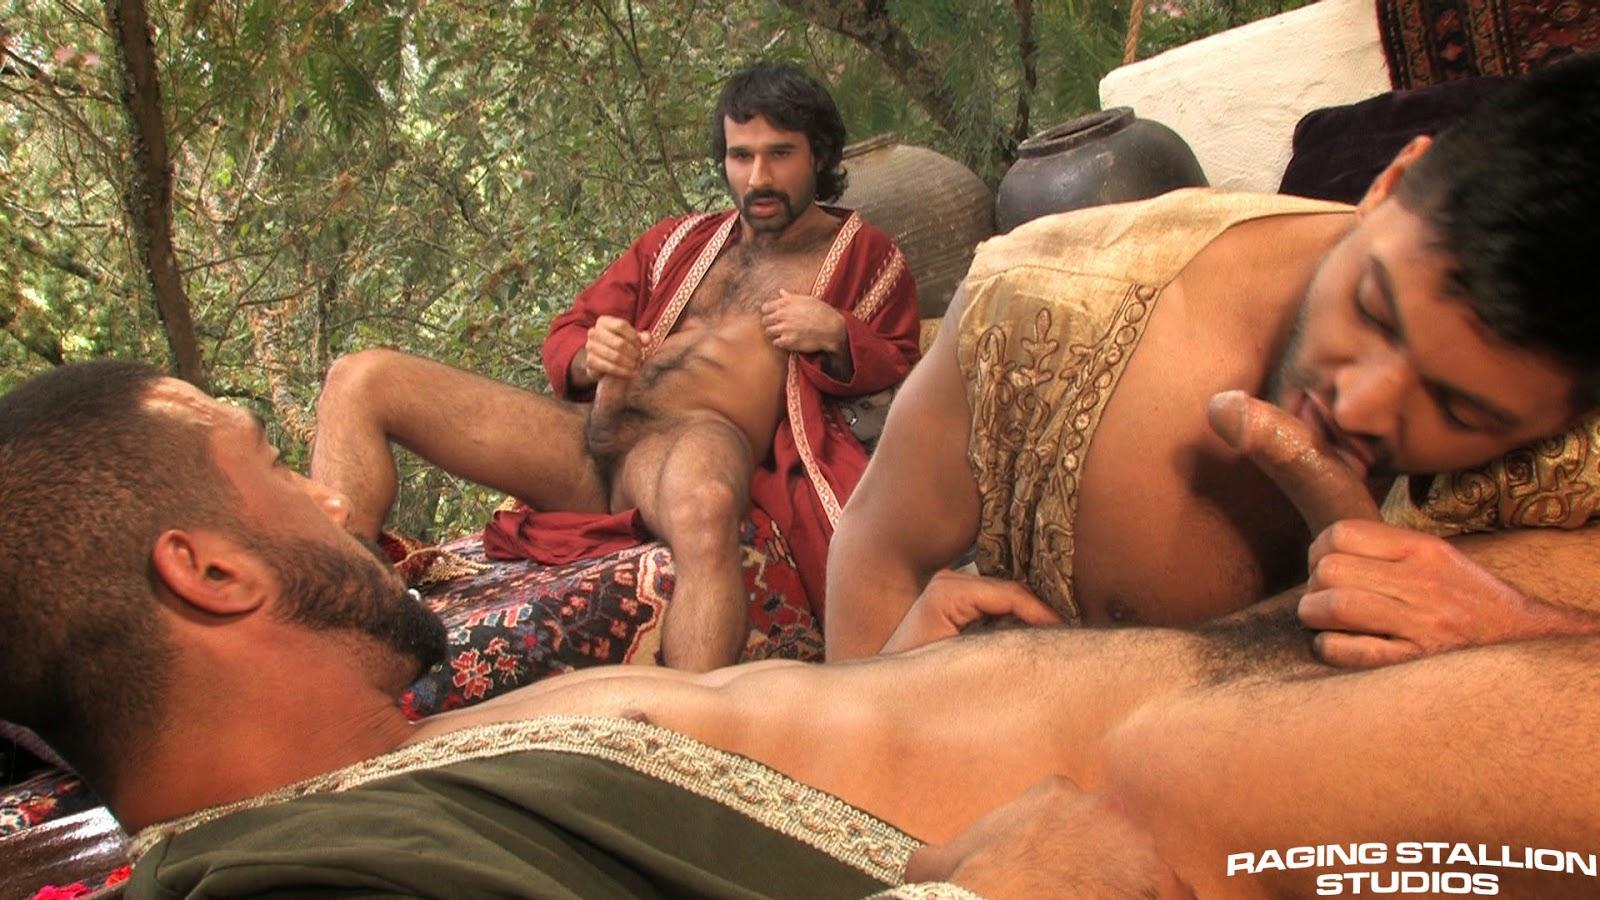 Arab porn gay movies